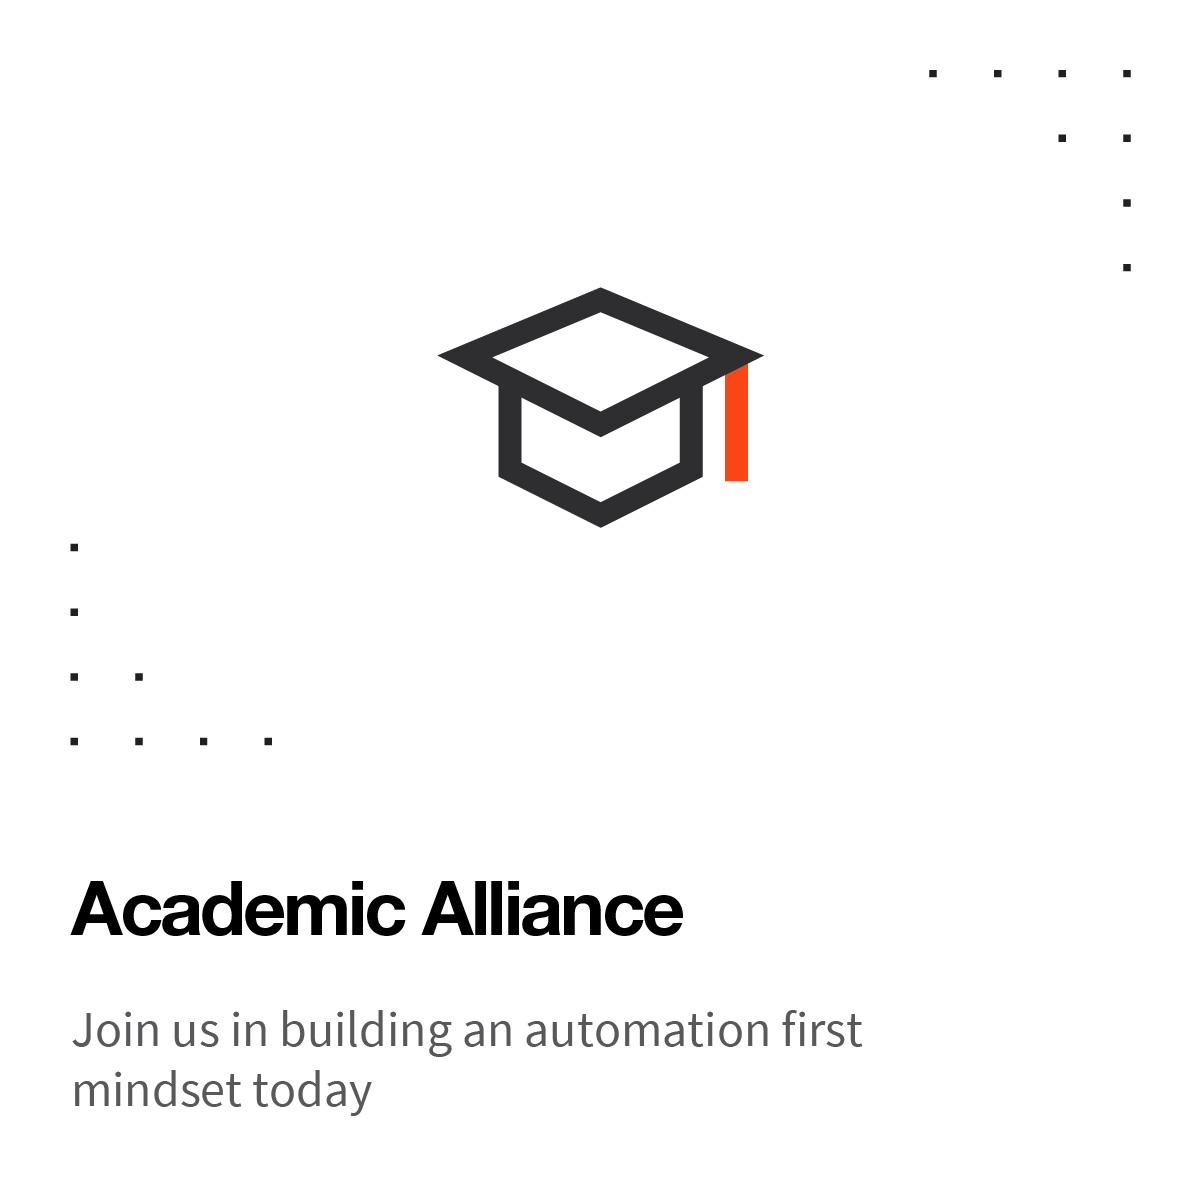 Academic Alliance